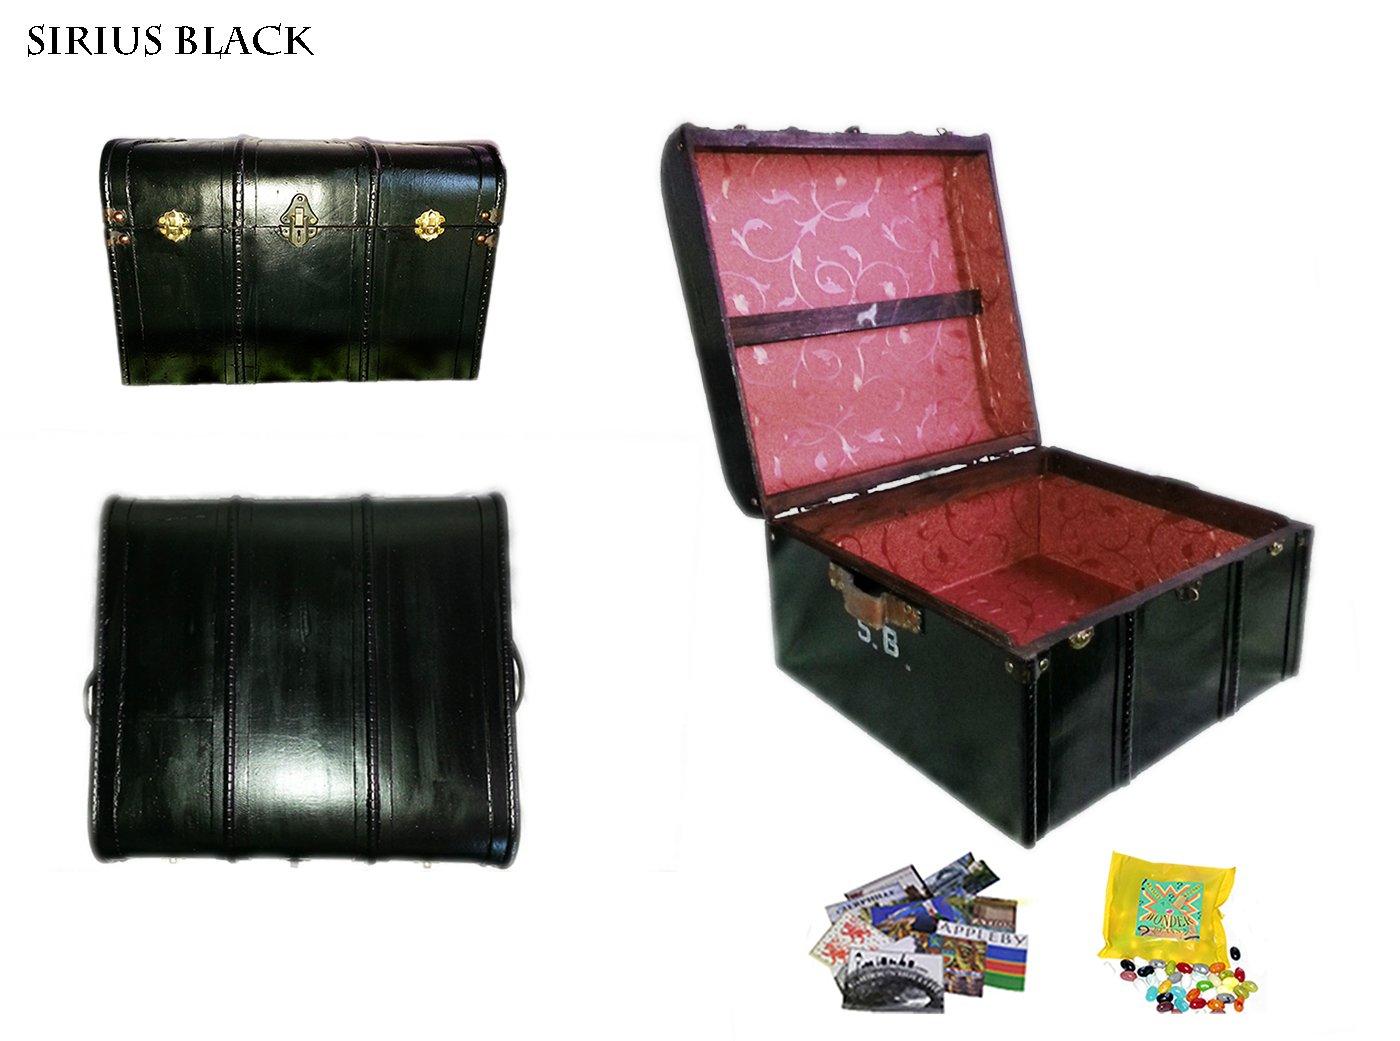 Hogwarts Trunk - Sirius Black Special Edition